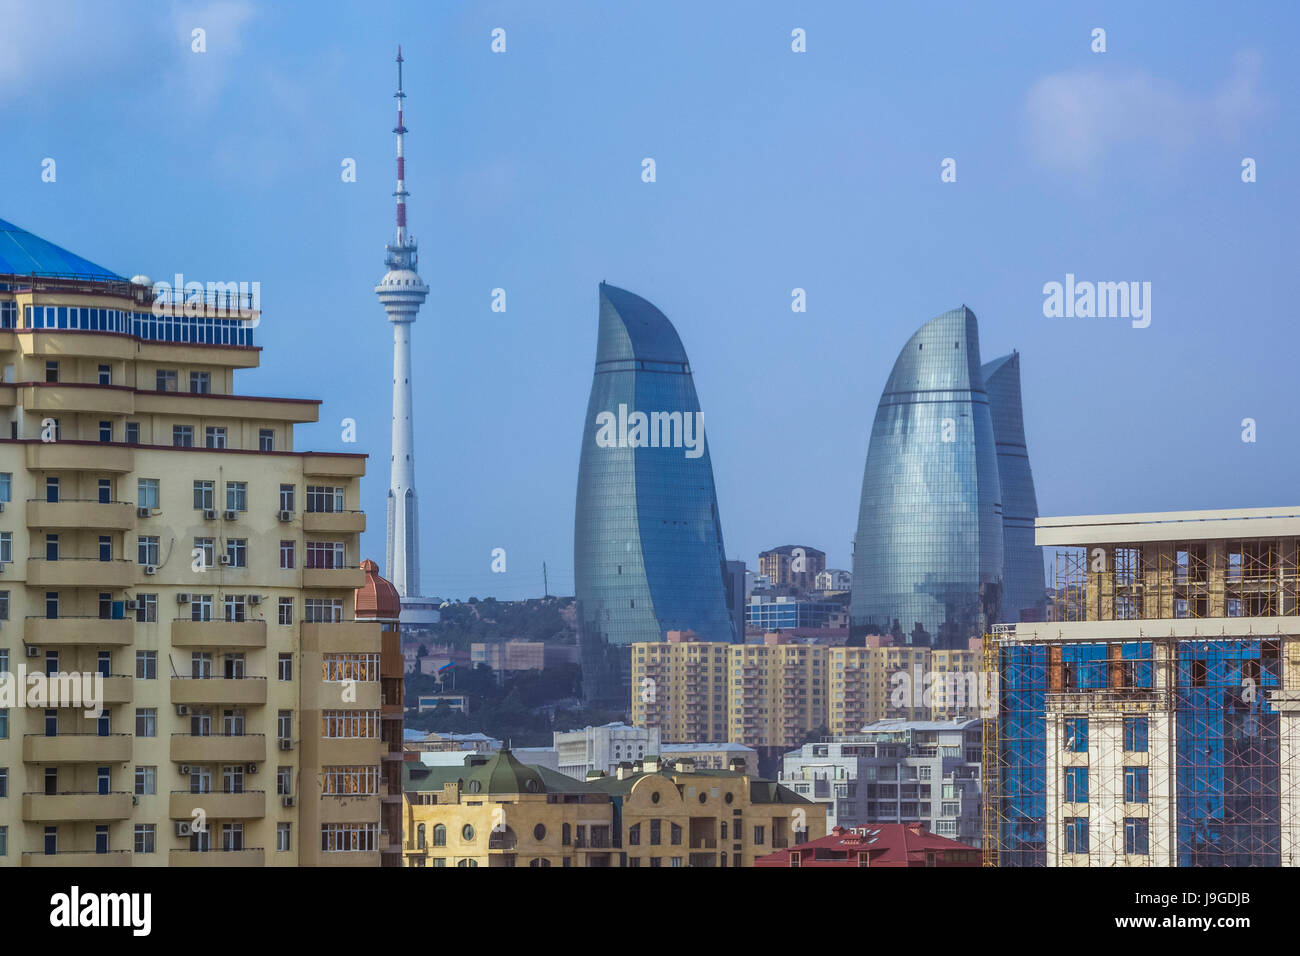 Azerbaijan, Baku City, Tele tower and the Flame Towers, - Stock Image